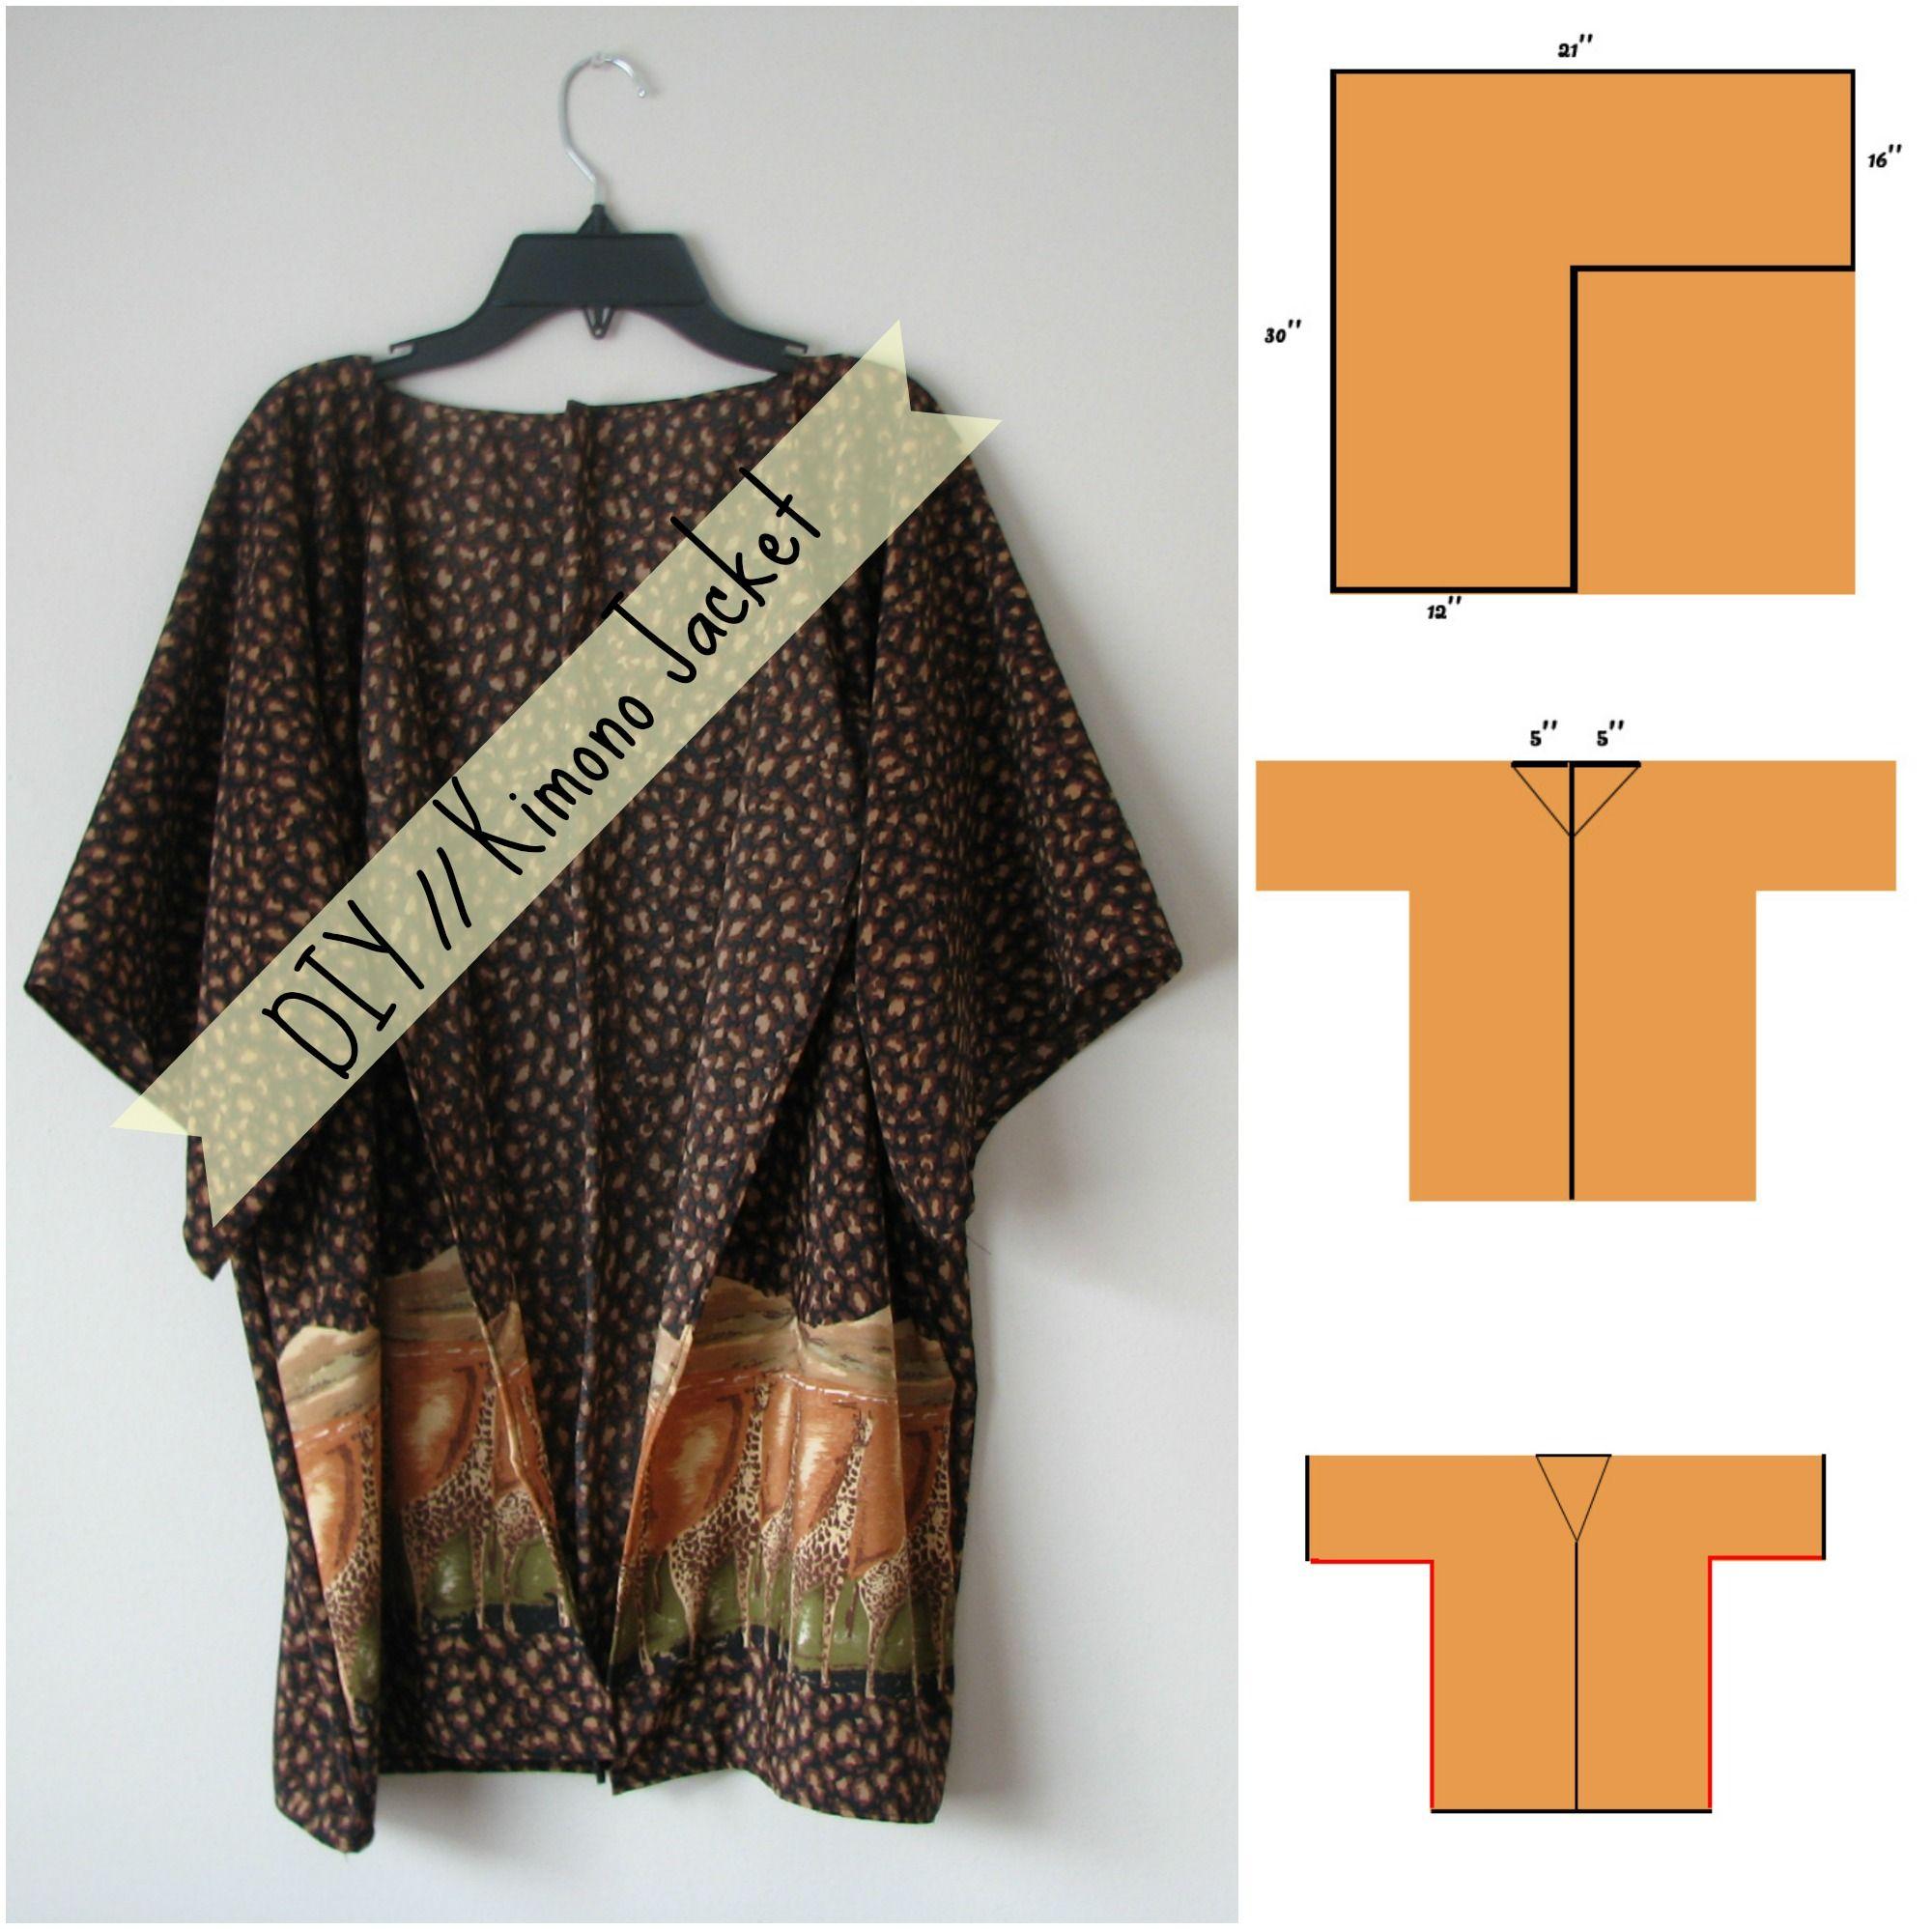 kimono cardigan c and a - Google претрага | DIY | Pinterest | Nähen ...